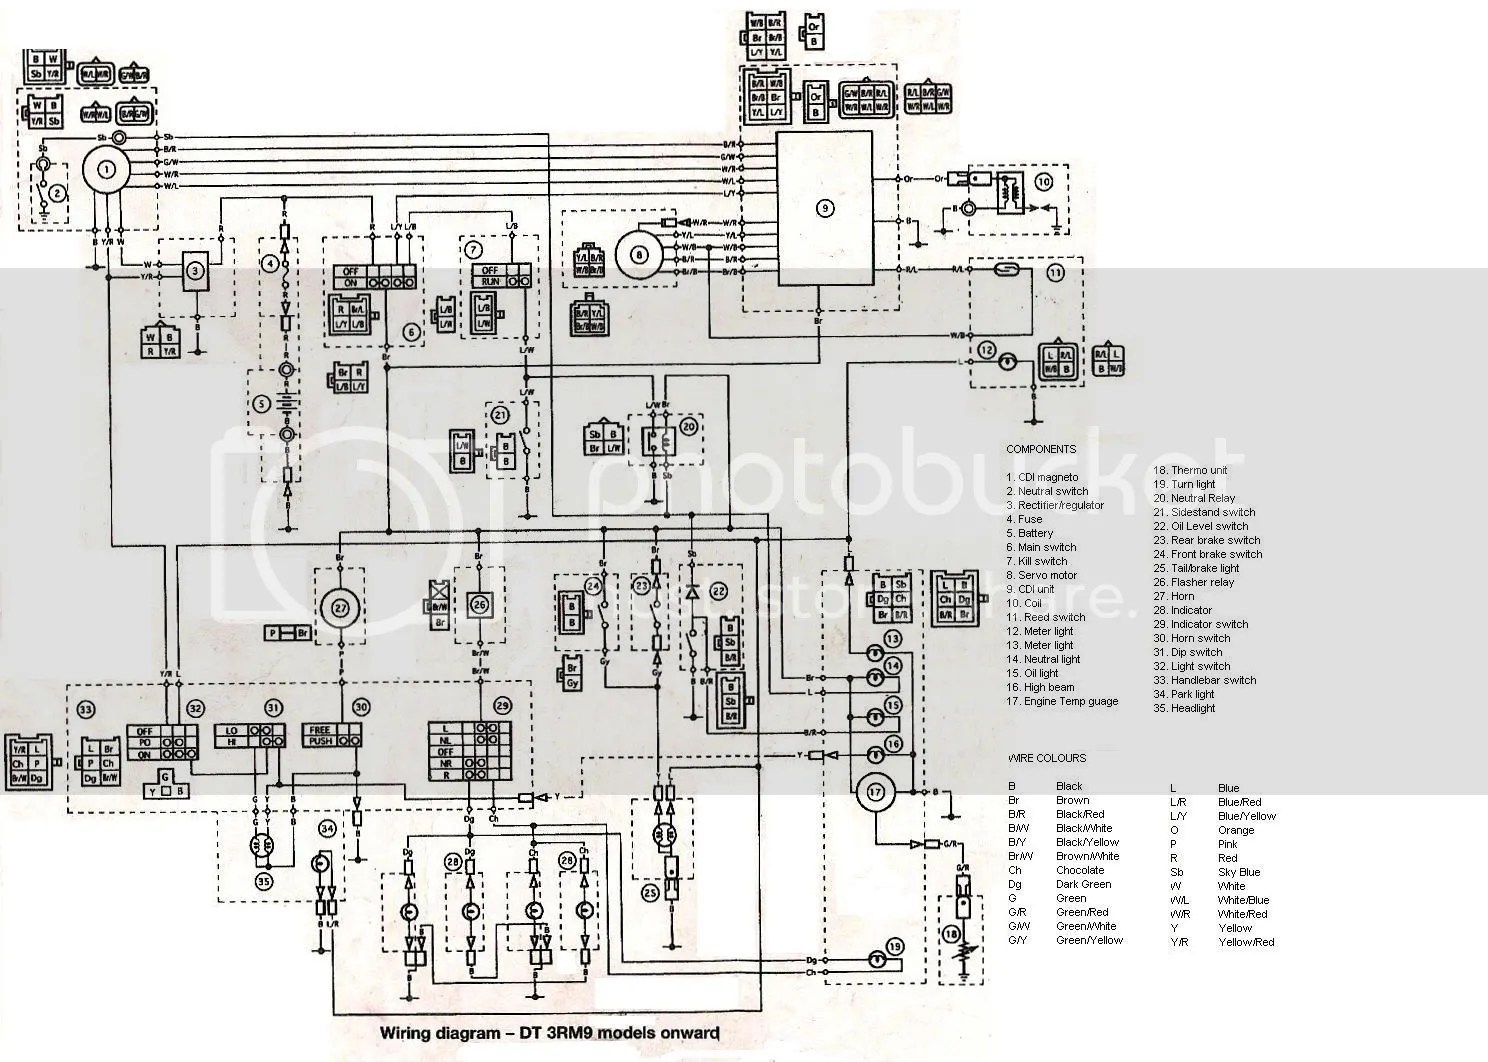 hight resolution of whizzer wiring diagram wiring diagram str whizzer wiring diagram